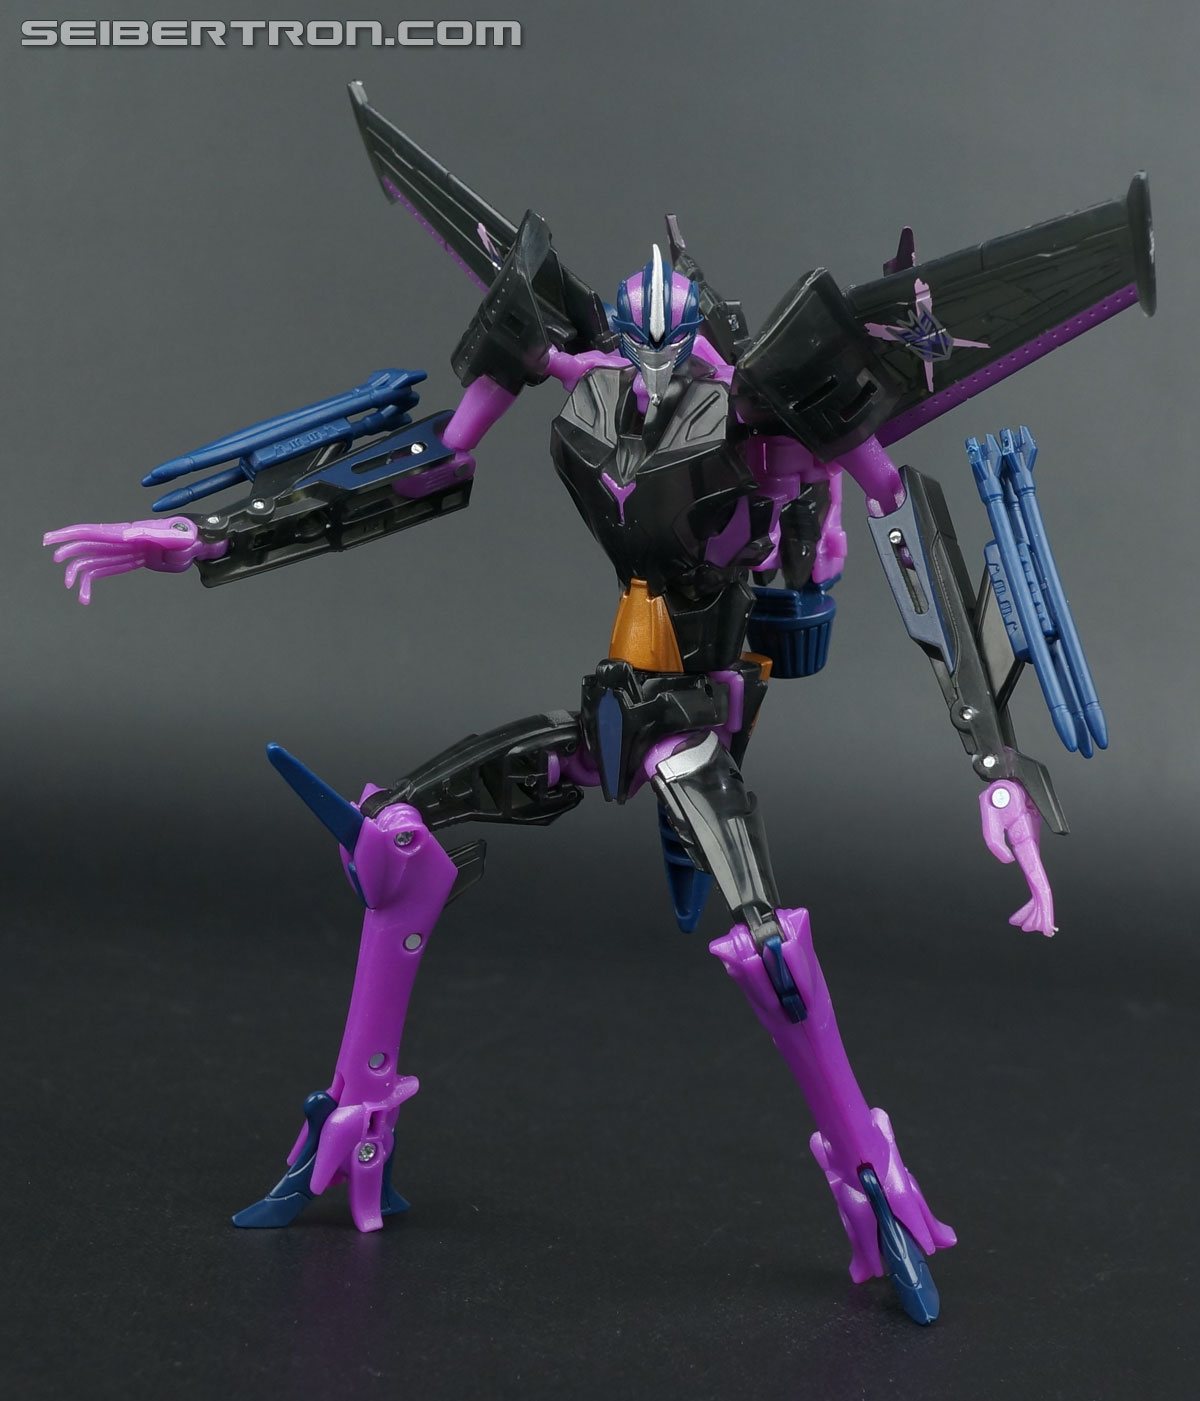 Transformers Prime: Robots In Disguise Dark Energon Starscream (Image #96 of 128)